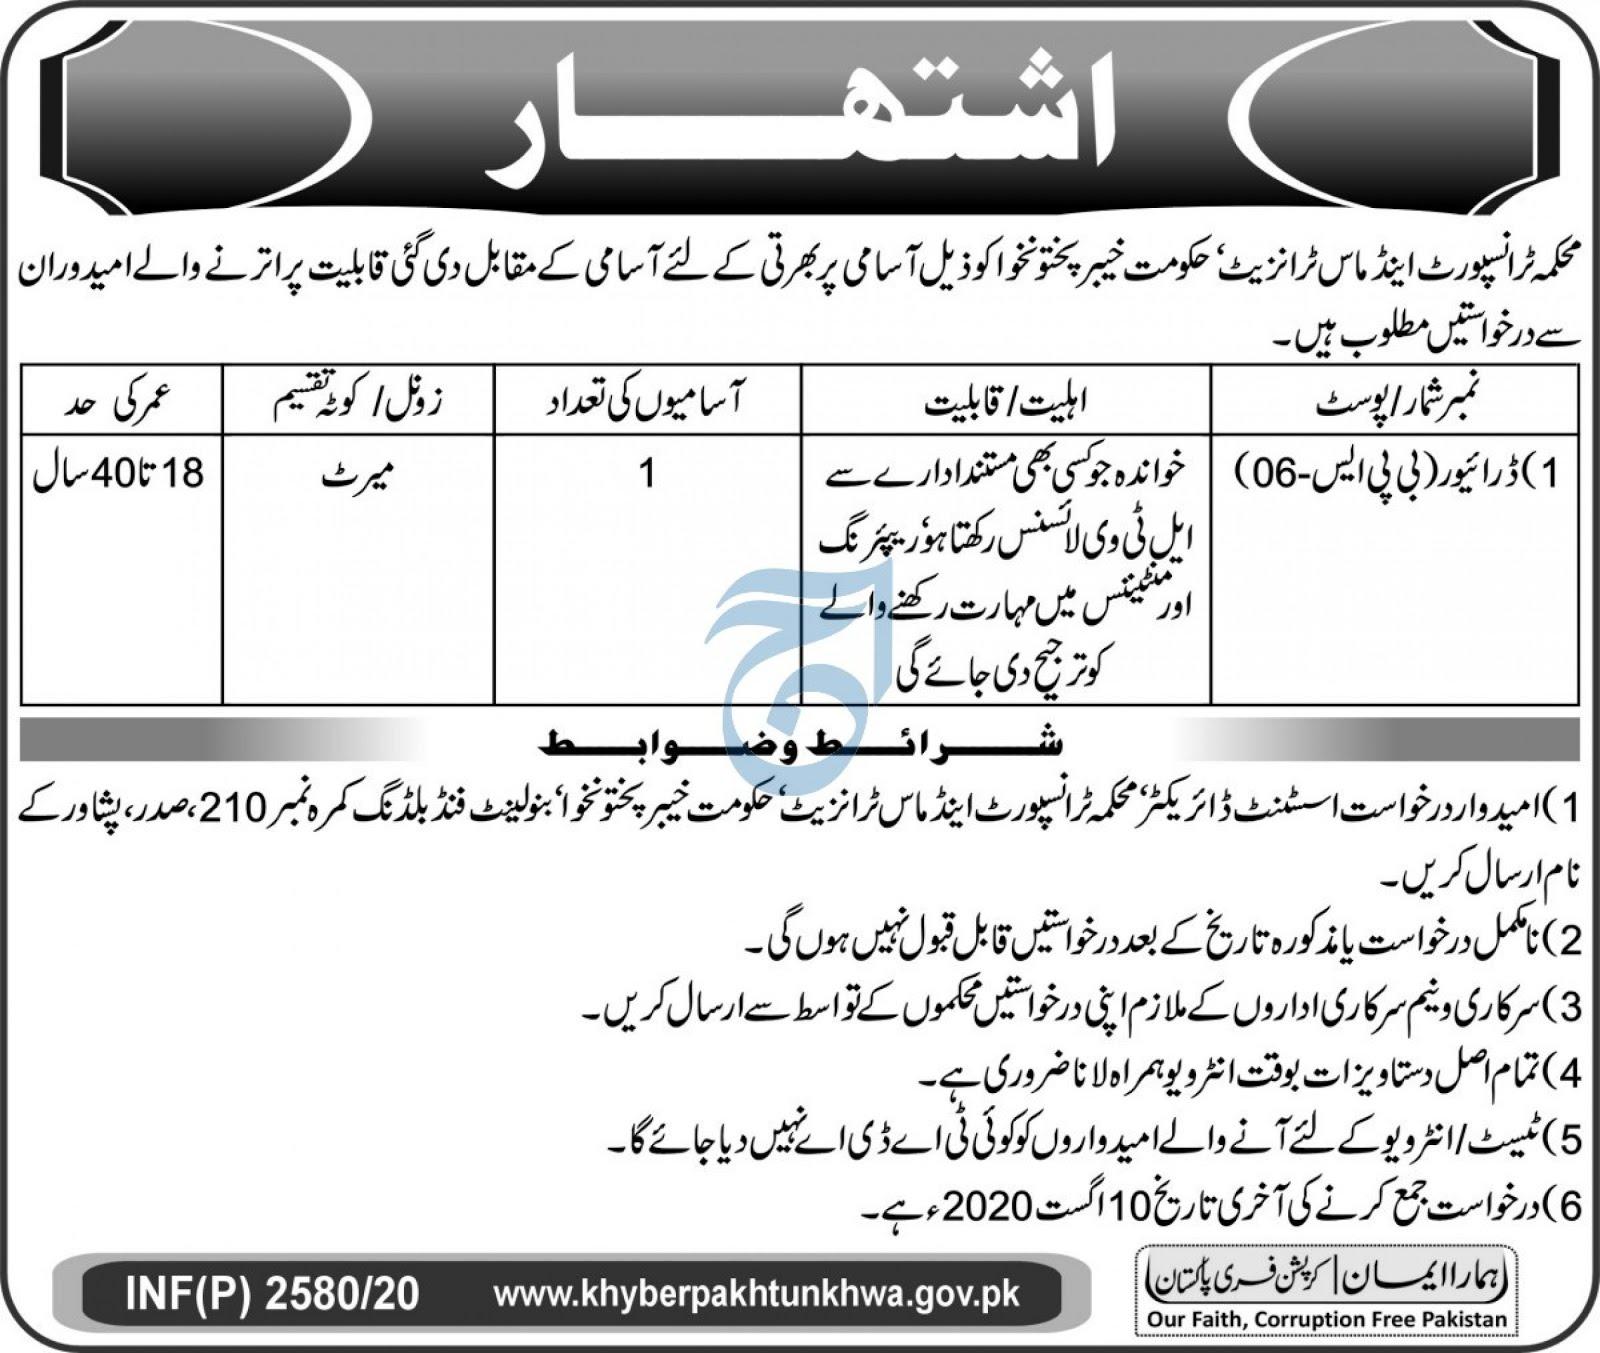 Transport & Mass Transit Department KPK Jobs 2020 Trans Peshawar Latest